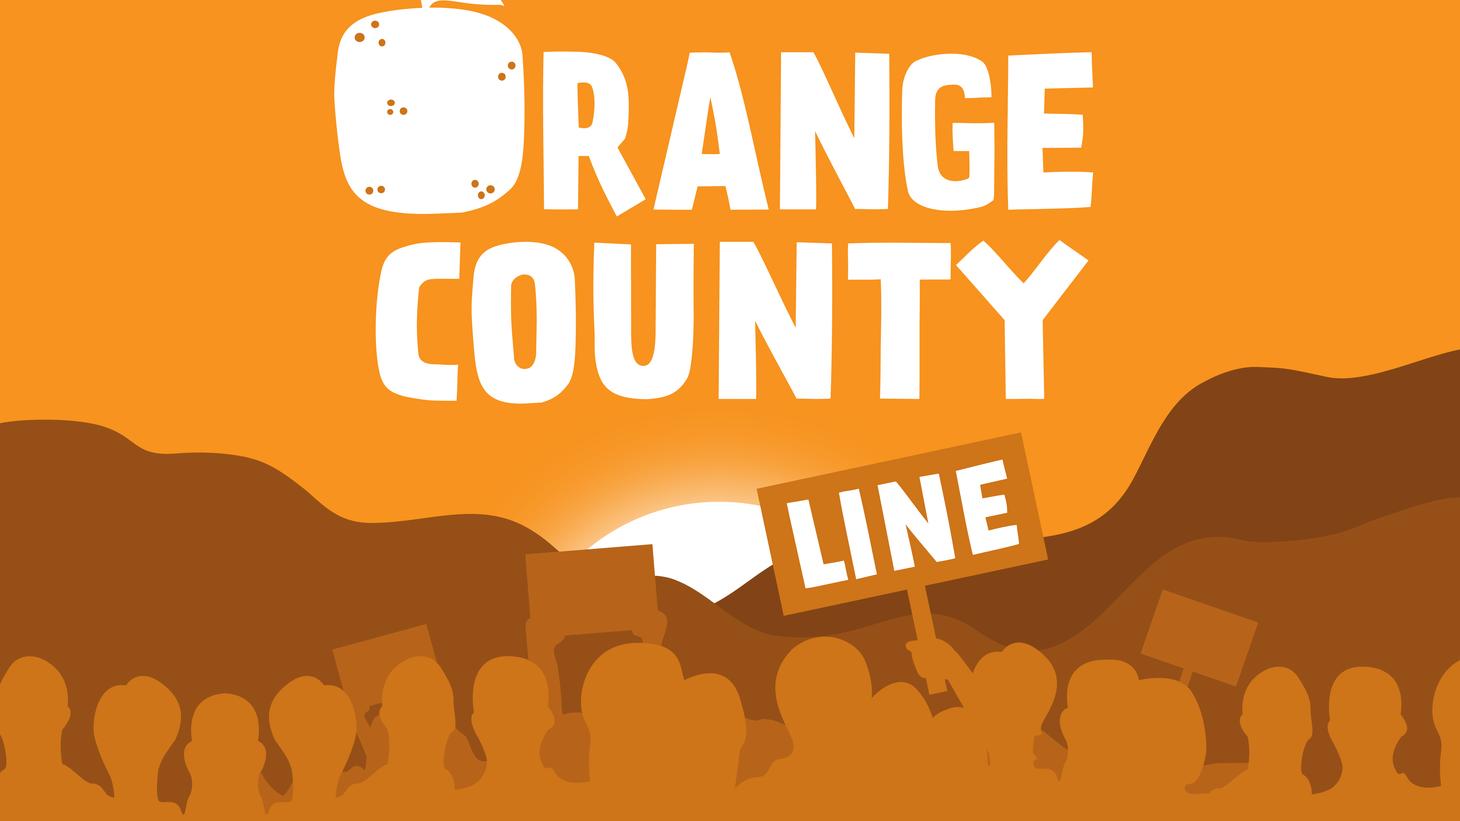 Last week, Nick Berardino announced that he'd retire in July as head of the Orange County Employee's Association.